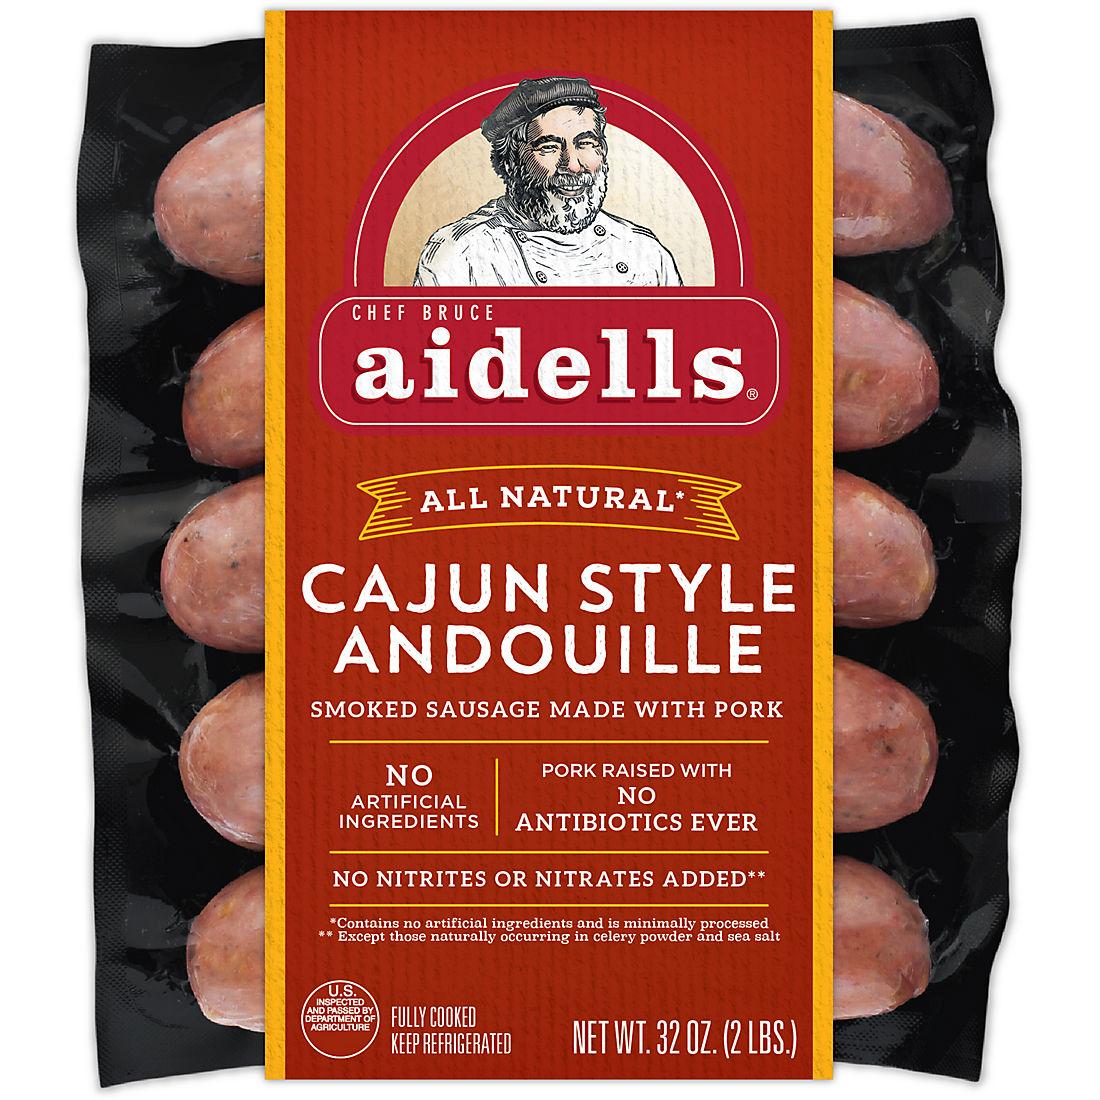 Aidells Cajun Style Andouille Smoked